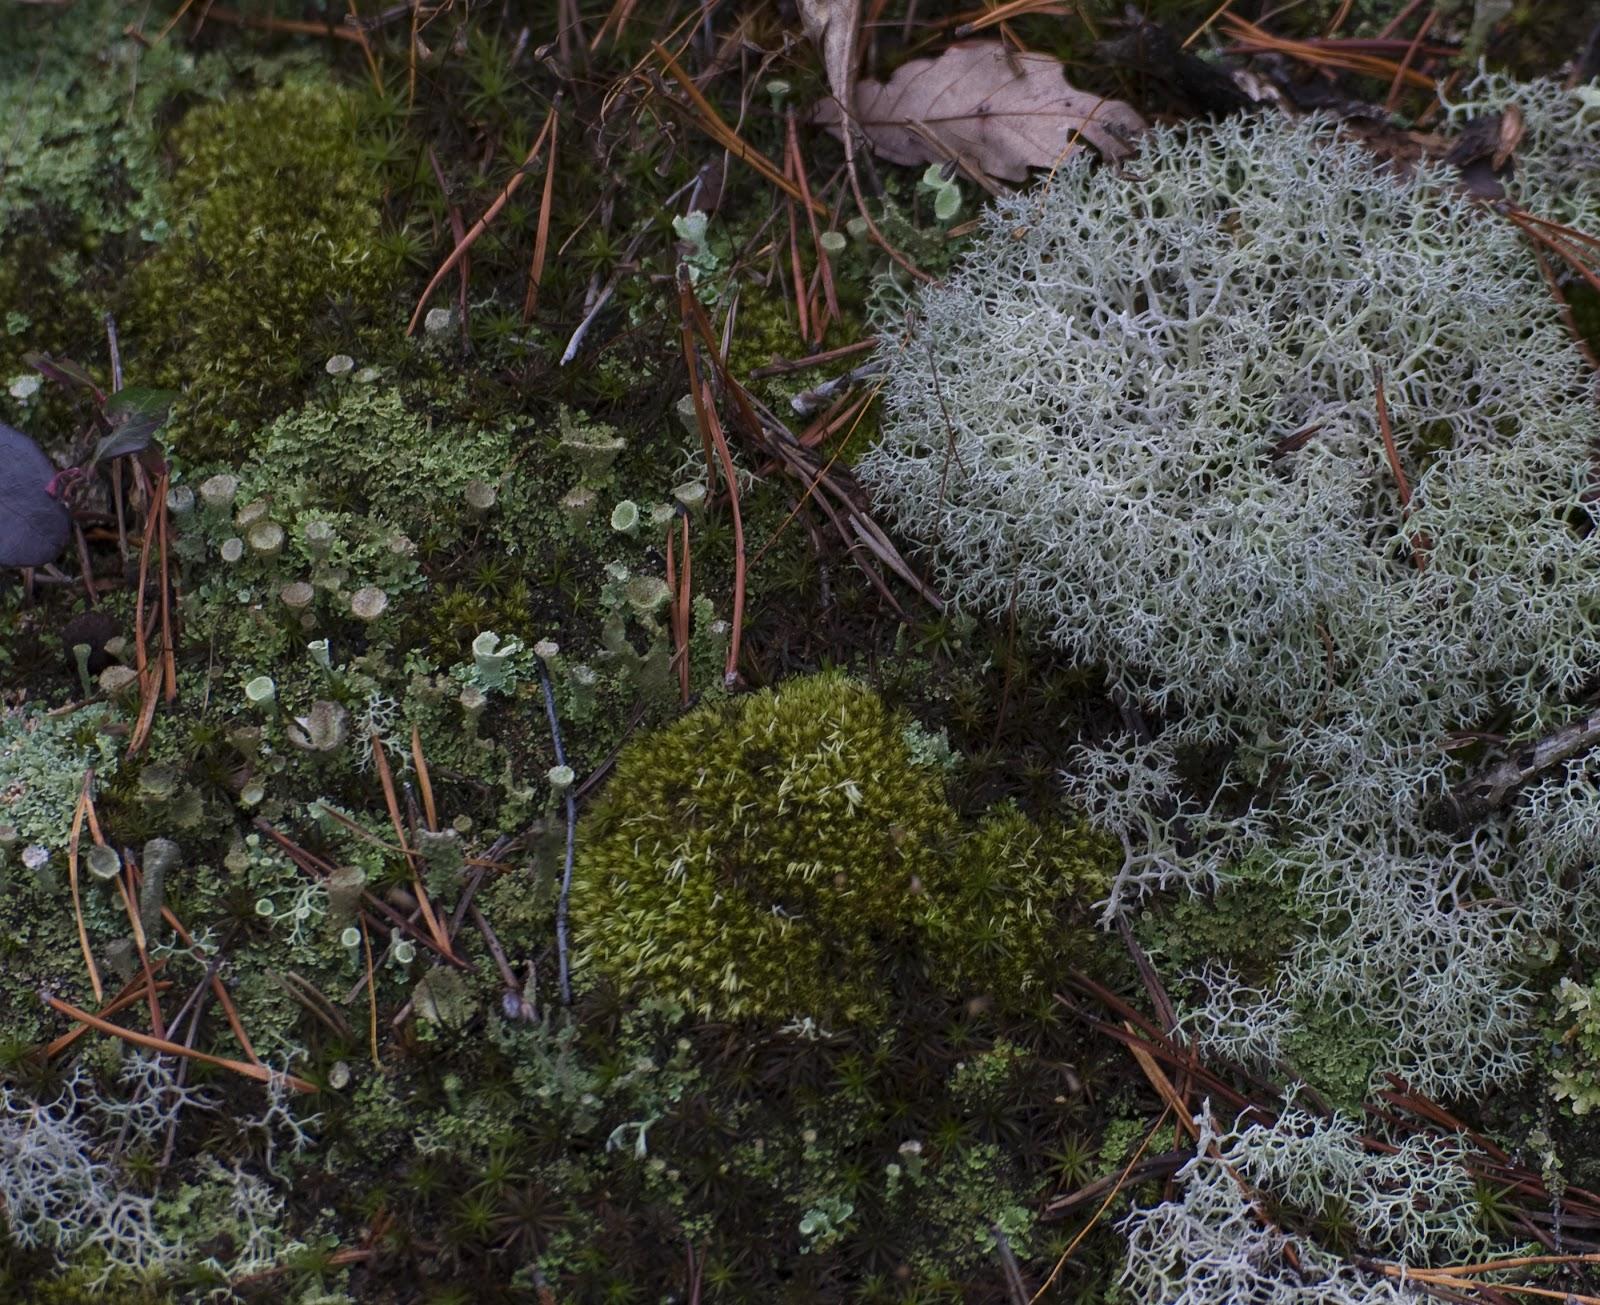 Mossy Oak Winter Break Up Wallpaper PicsWallpapercom 1600x1305